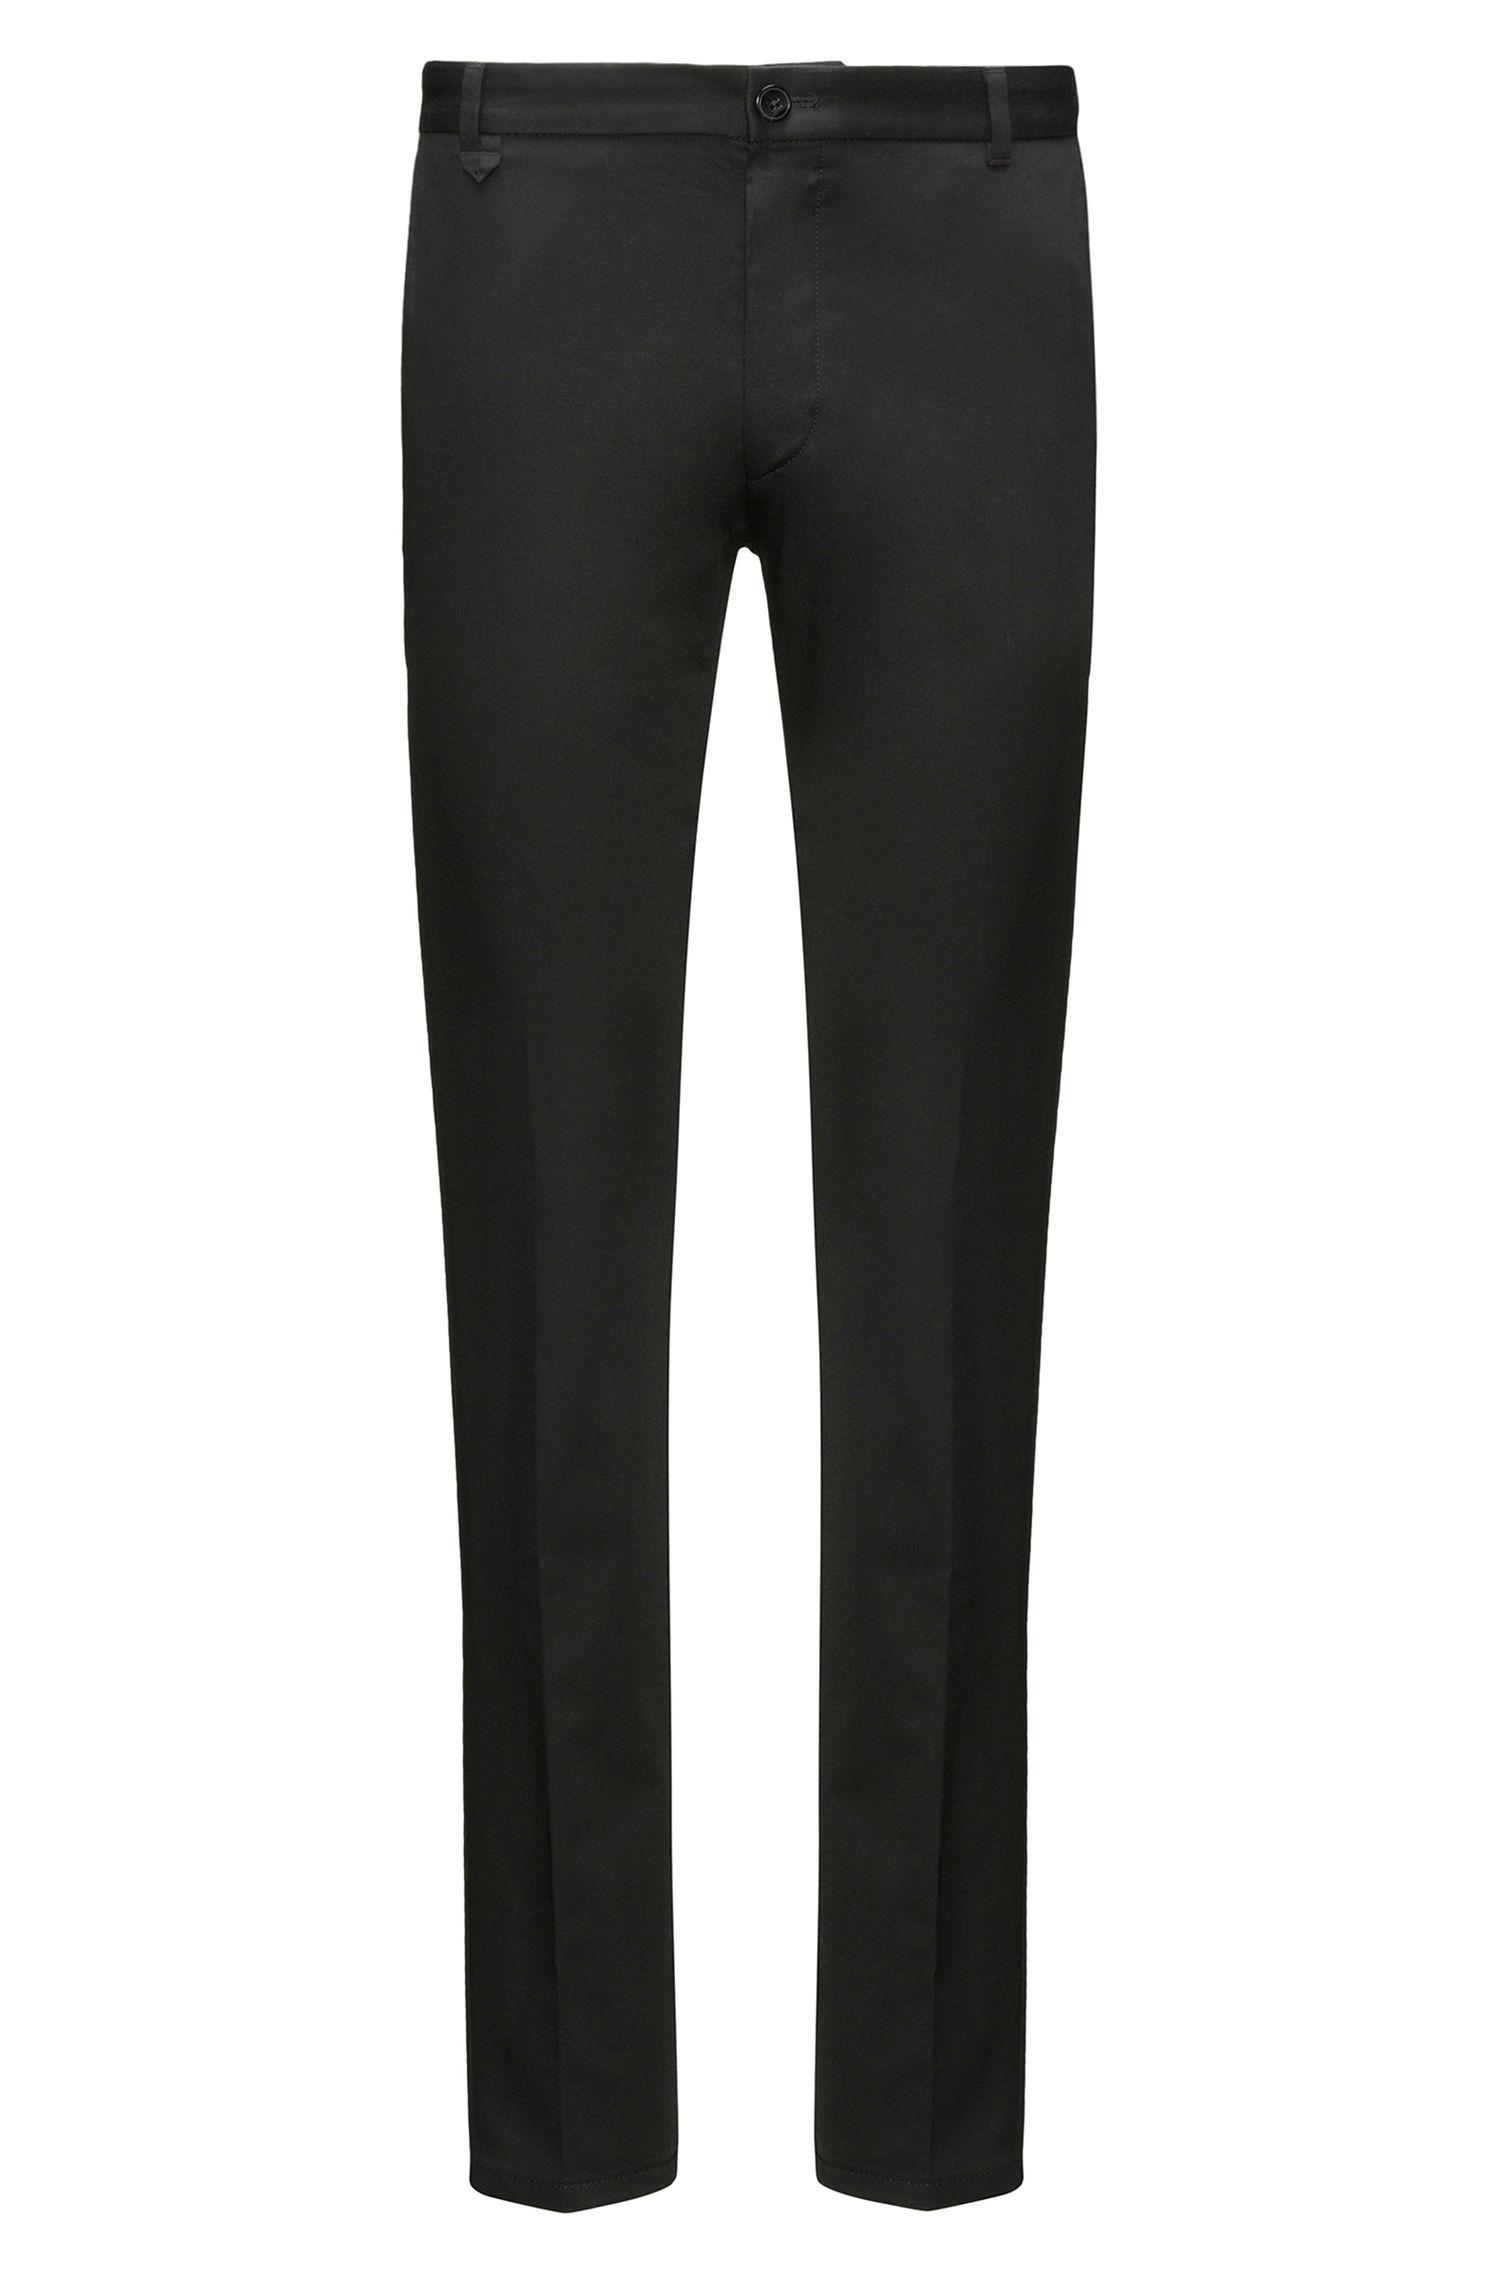 Stretch Cotton Pants, Extra Slim Fit | Heldor, Black